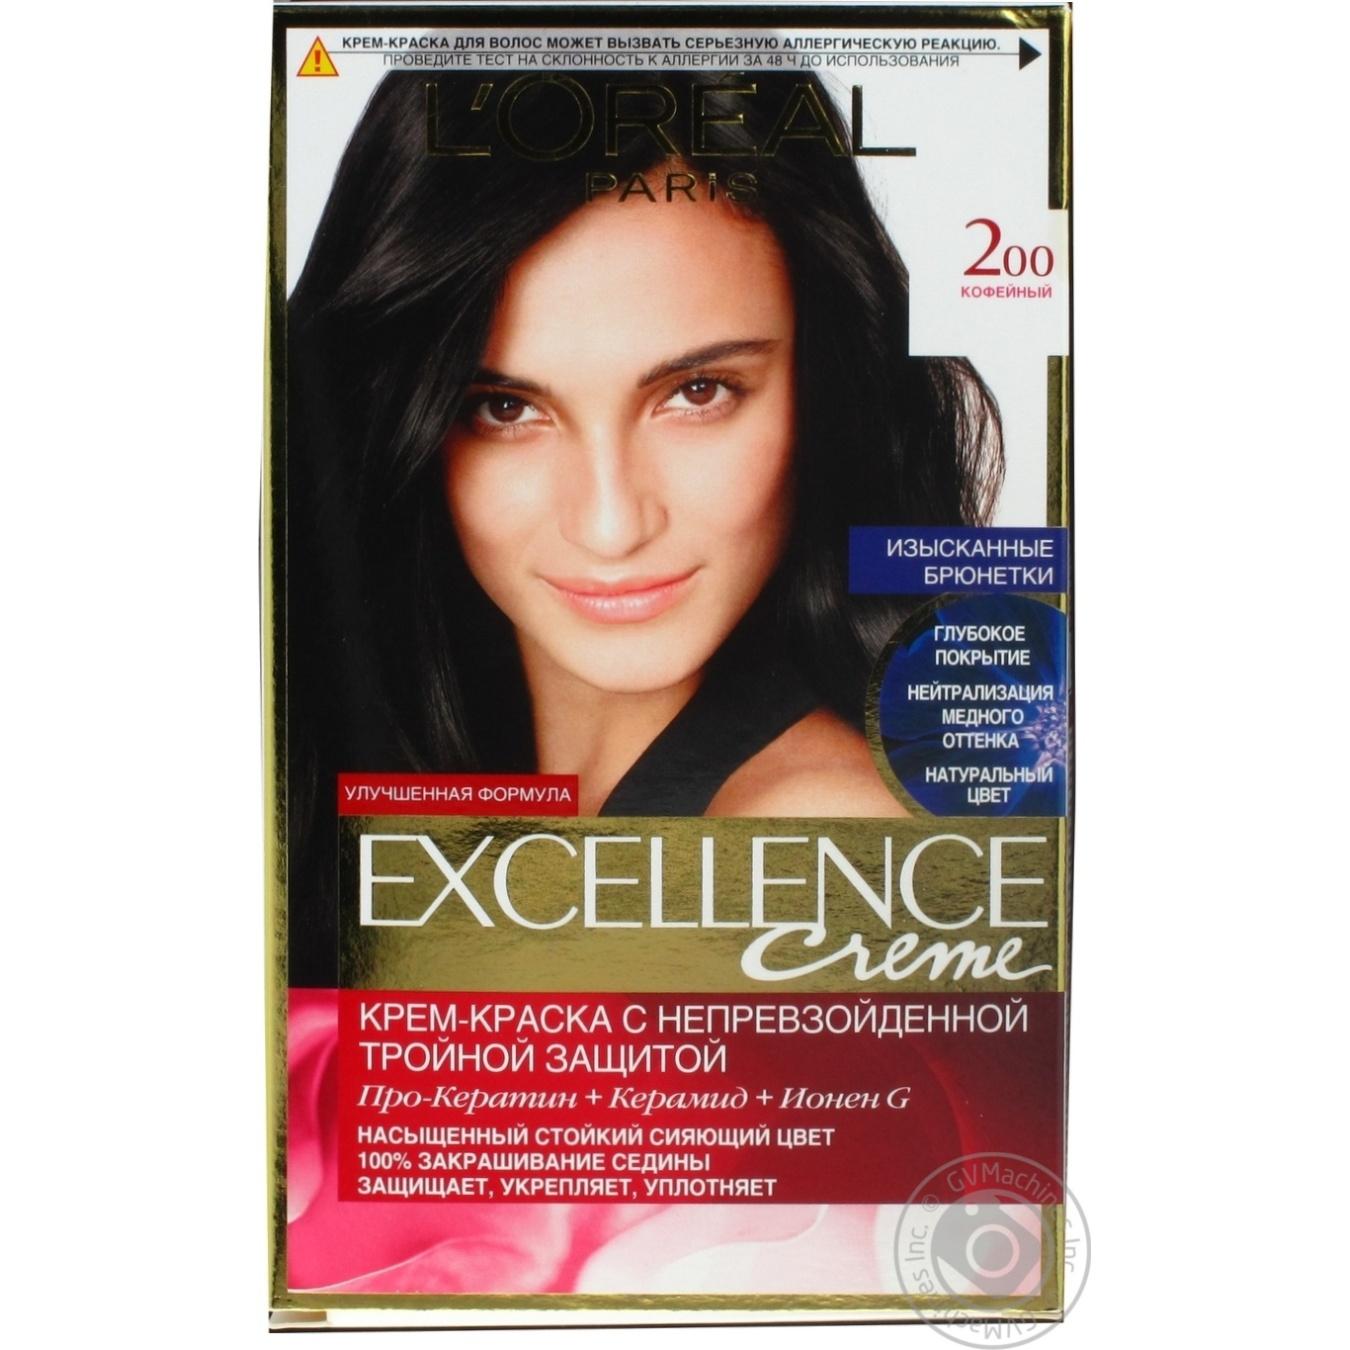 Купить Догляд, Крем-фарба для волосся L'Oreal Excellence Creme 200 кавовий